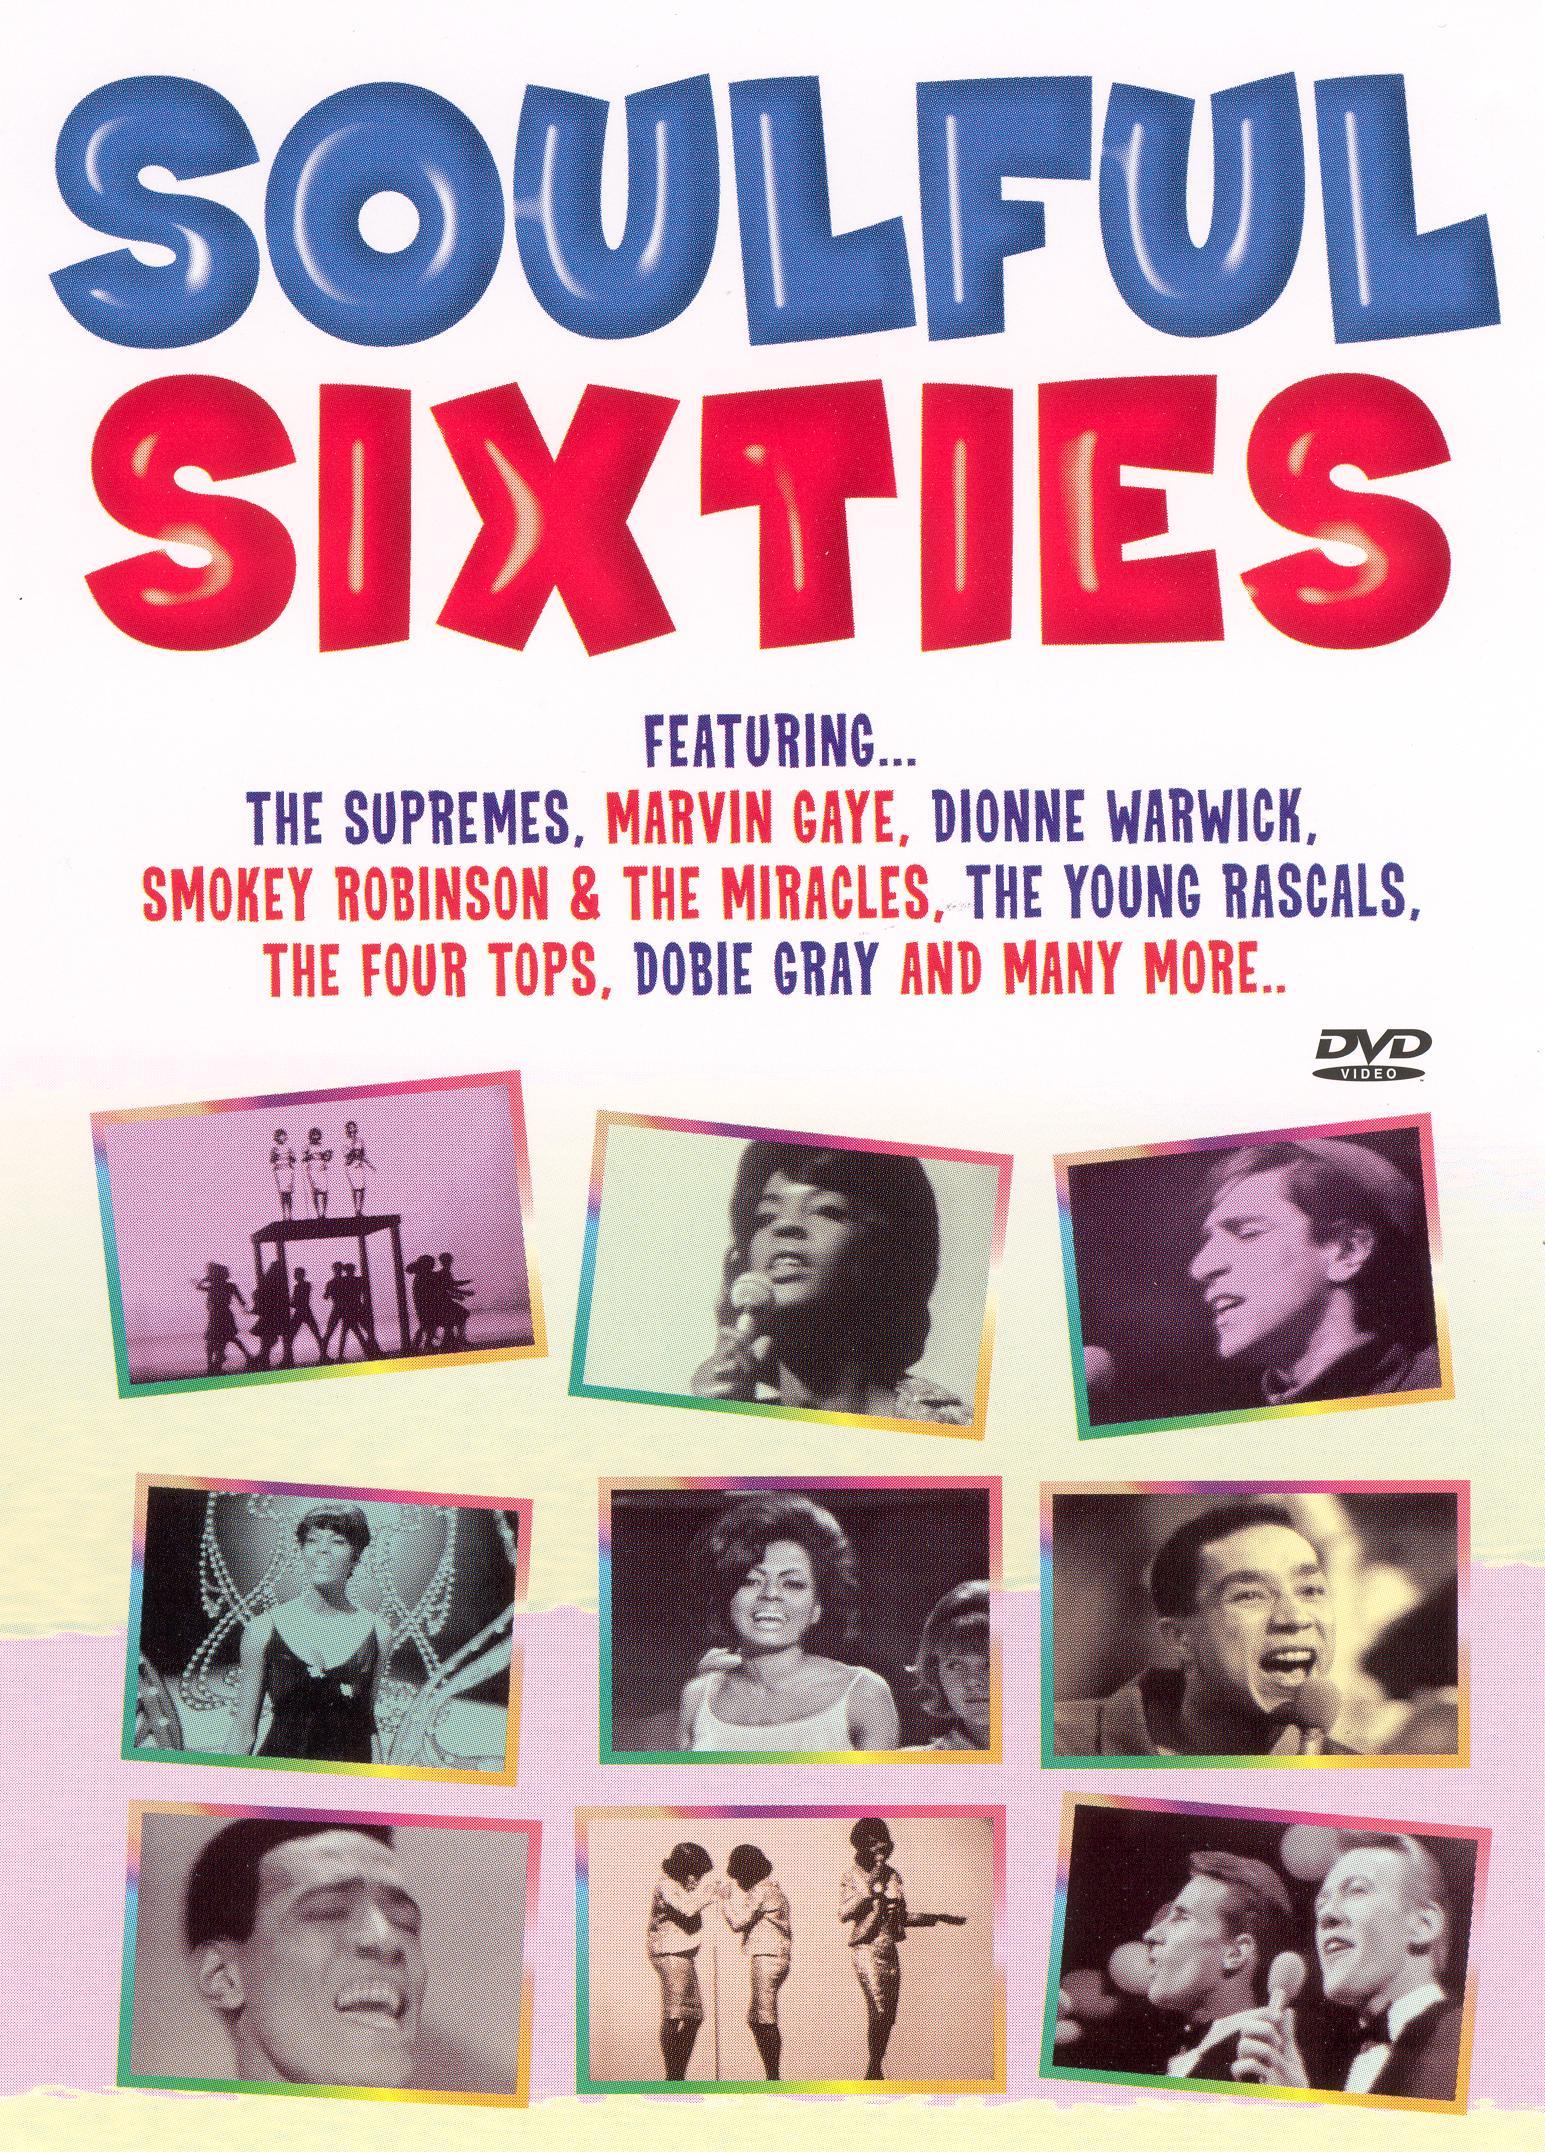 Soulful Sixties